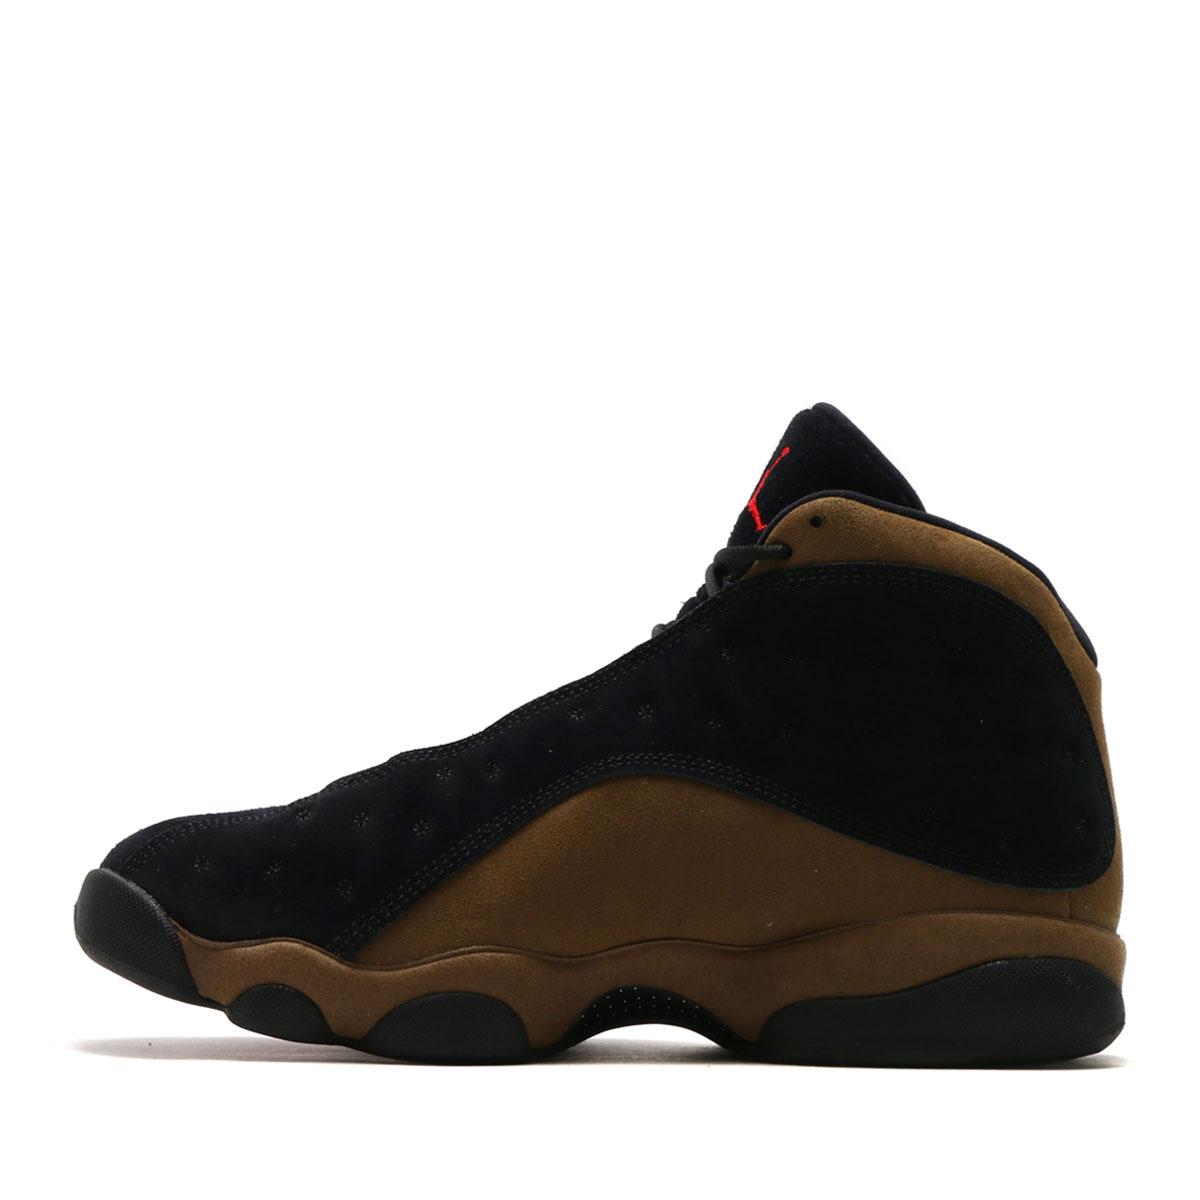 6360ef35767de7 NIKE AIR JORDAN 13 RETRO (nostalgic Nike Air Jordan 13) (BLACK GYM RED-LIGHT  OLIVE-WHITE) 18SP-S